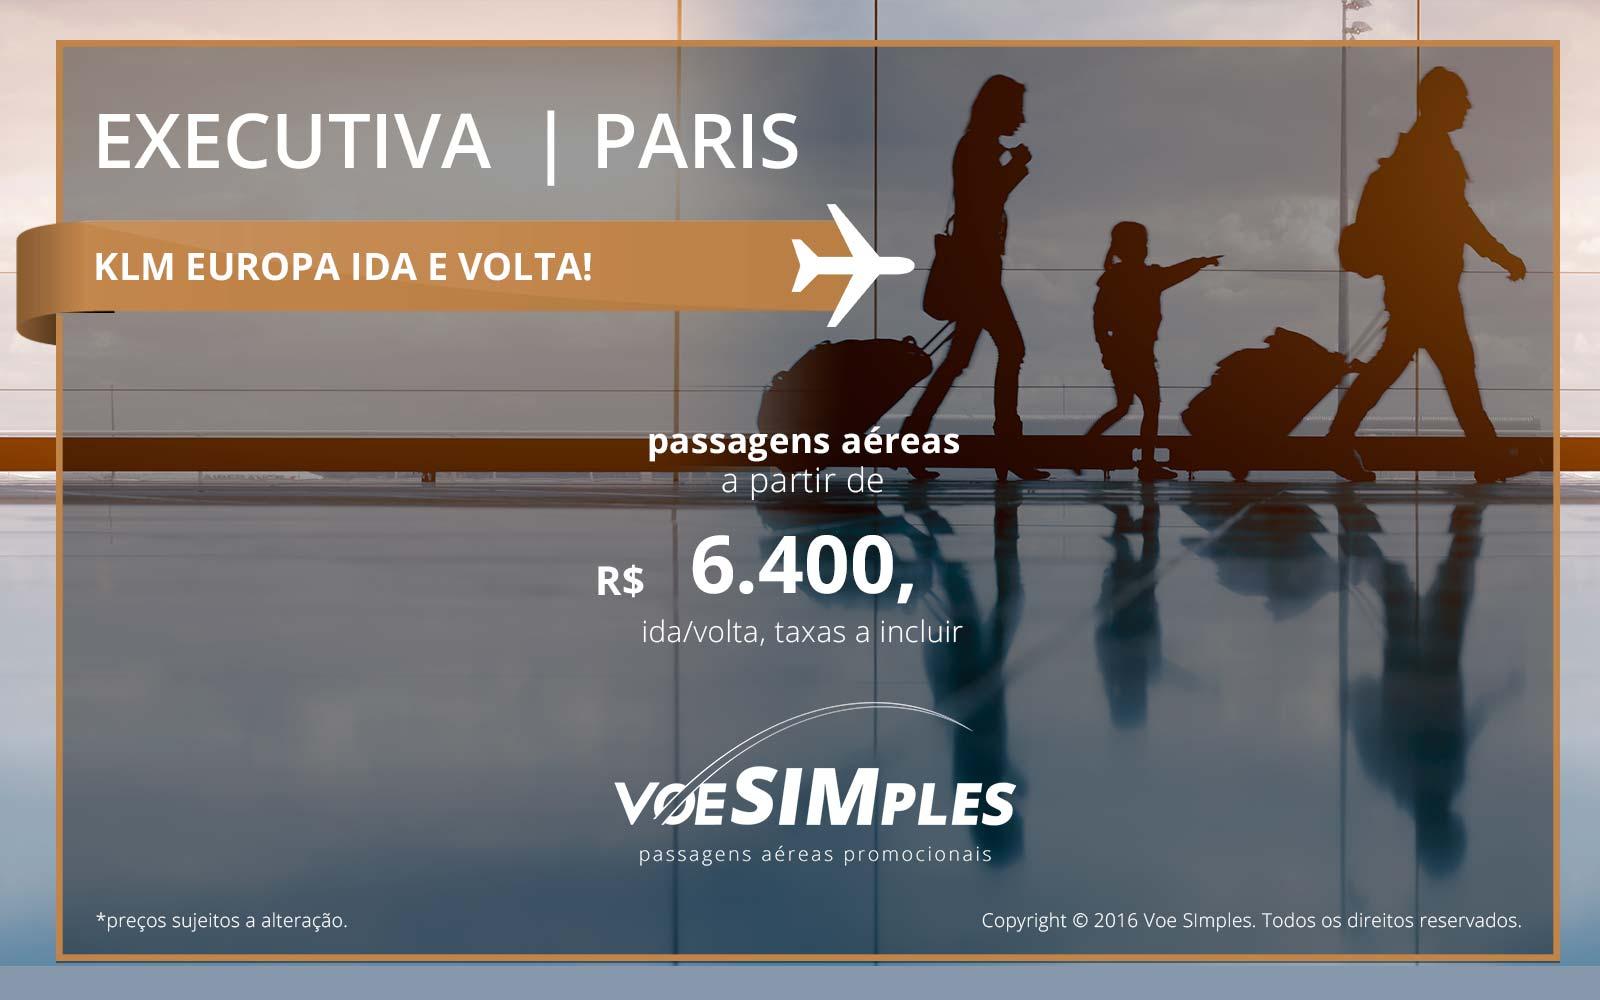 Passagem aérea Classe Executiva KLM para Paris